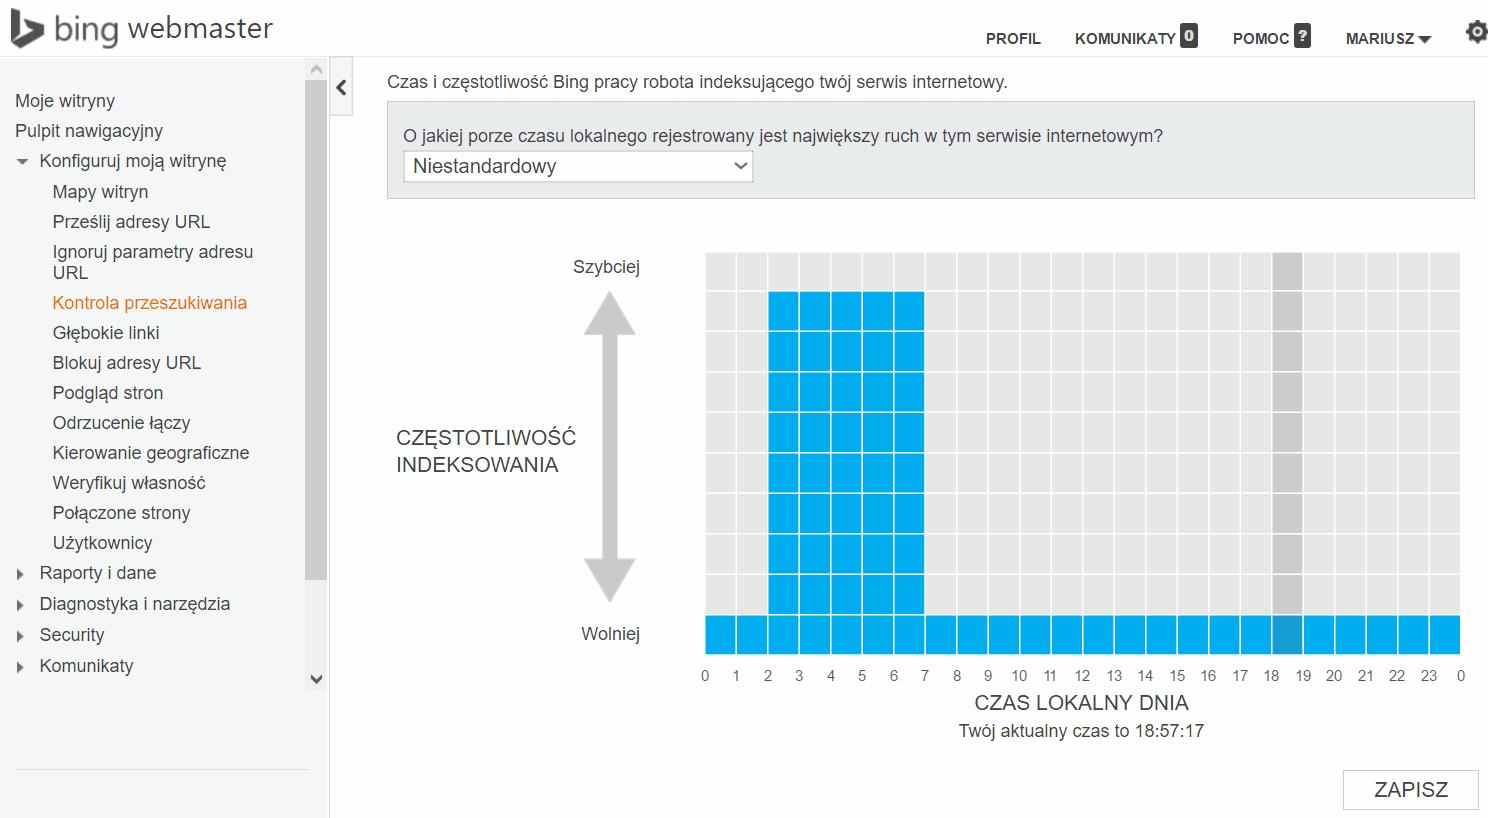 bing szybkość indeksowania